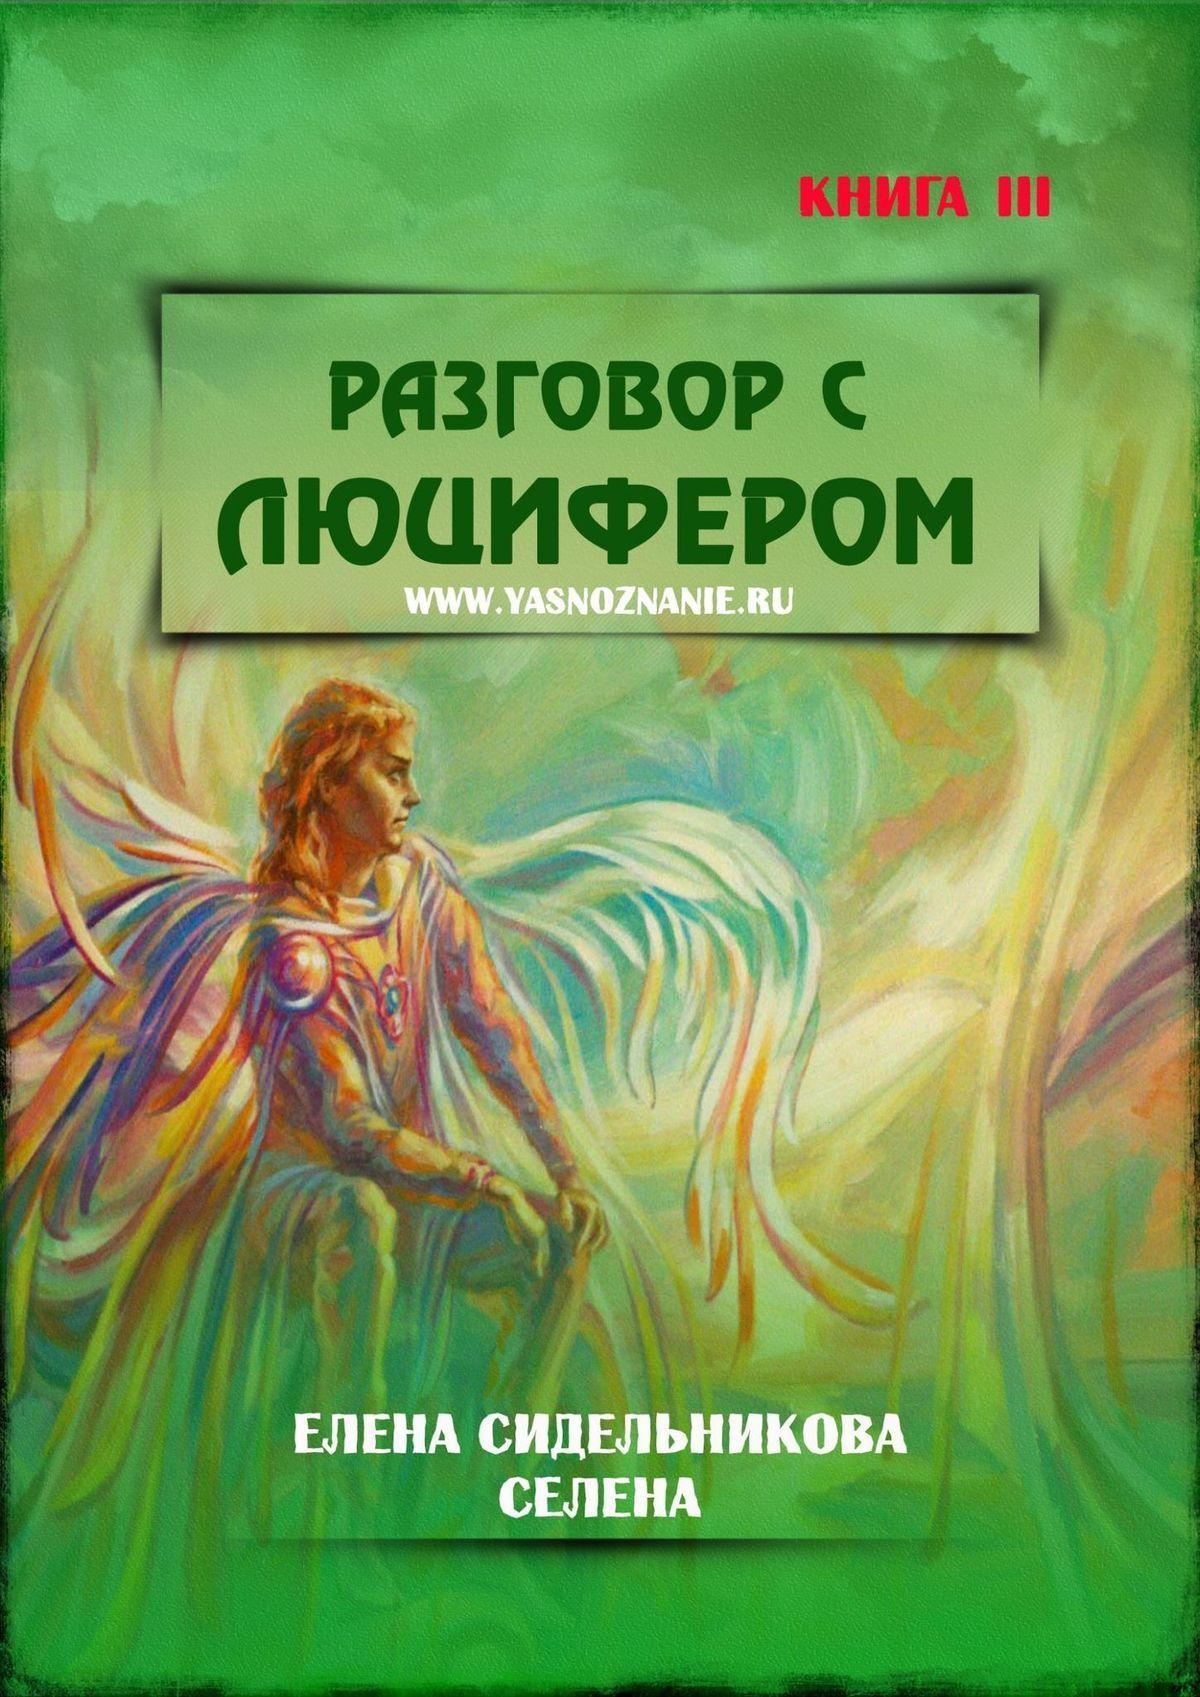 Елена Сидельникова Селена - Разговор сЛюцифером. Книга III